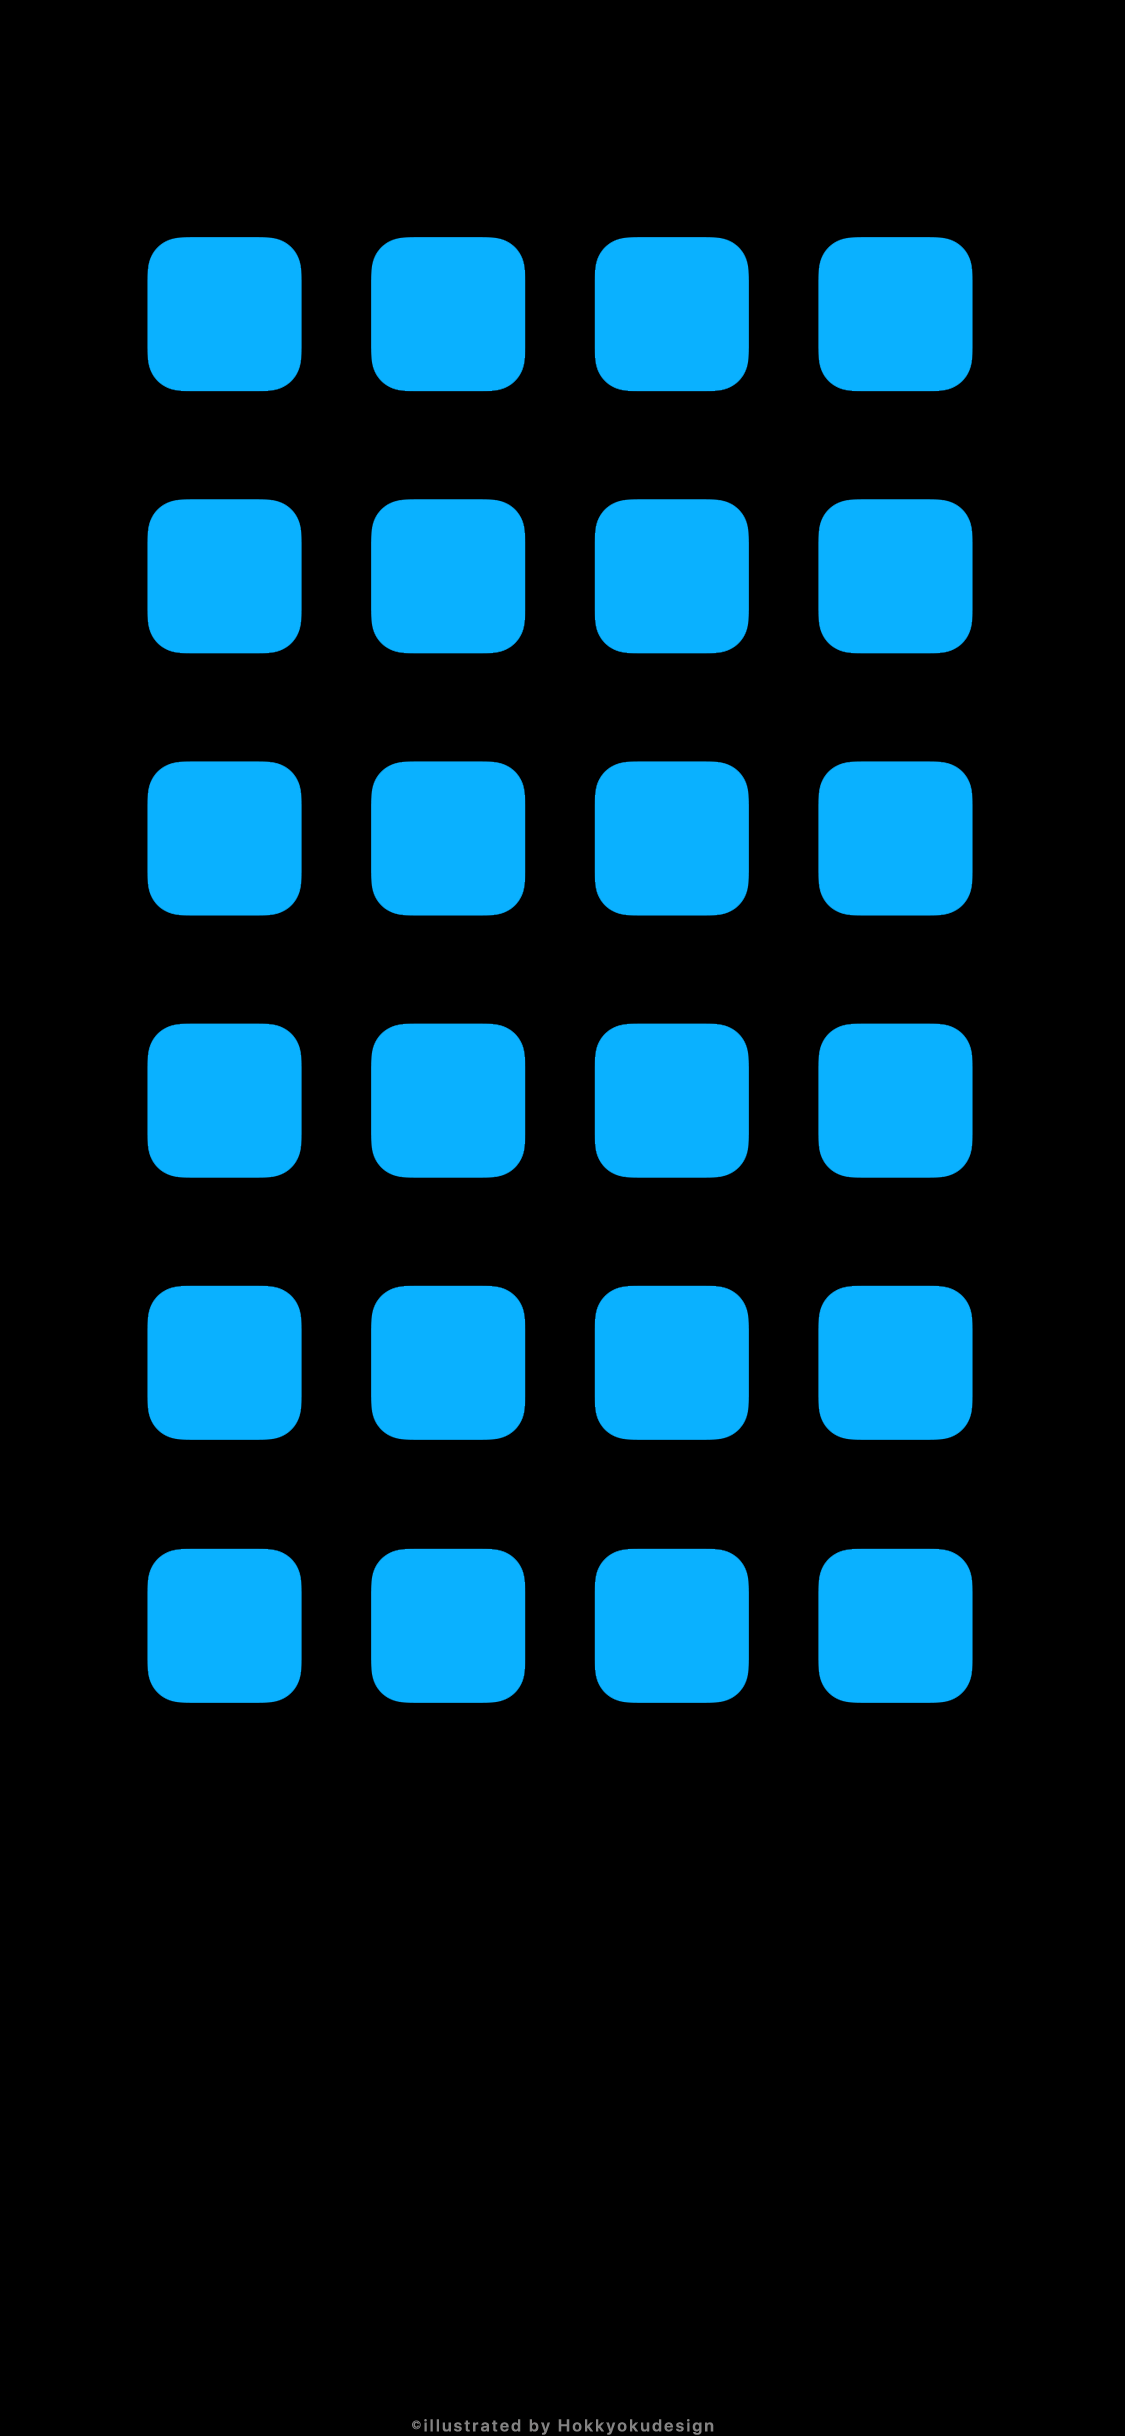 Iphone X壁紙 2 黒地に青背景